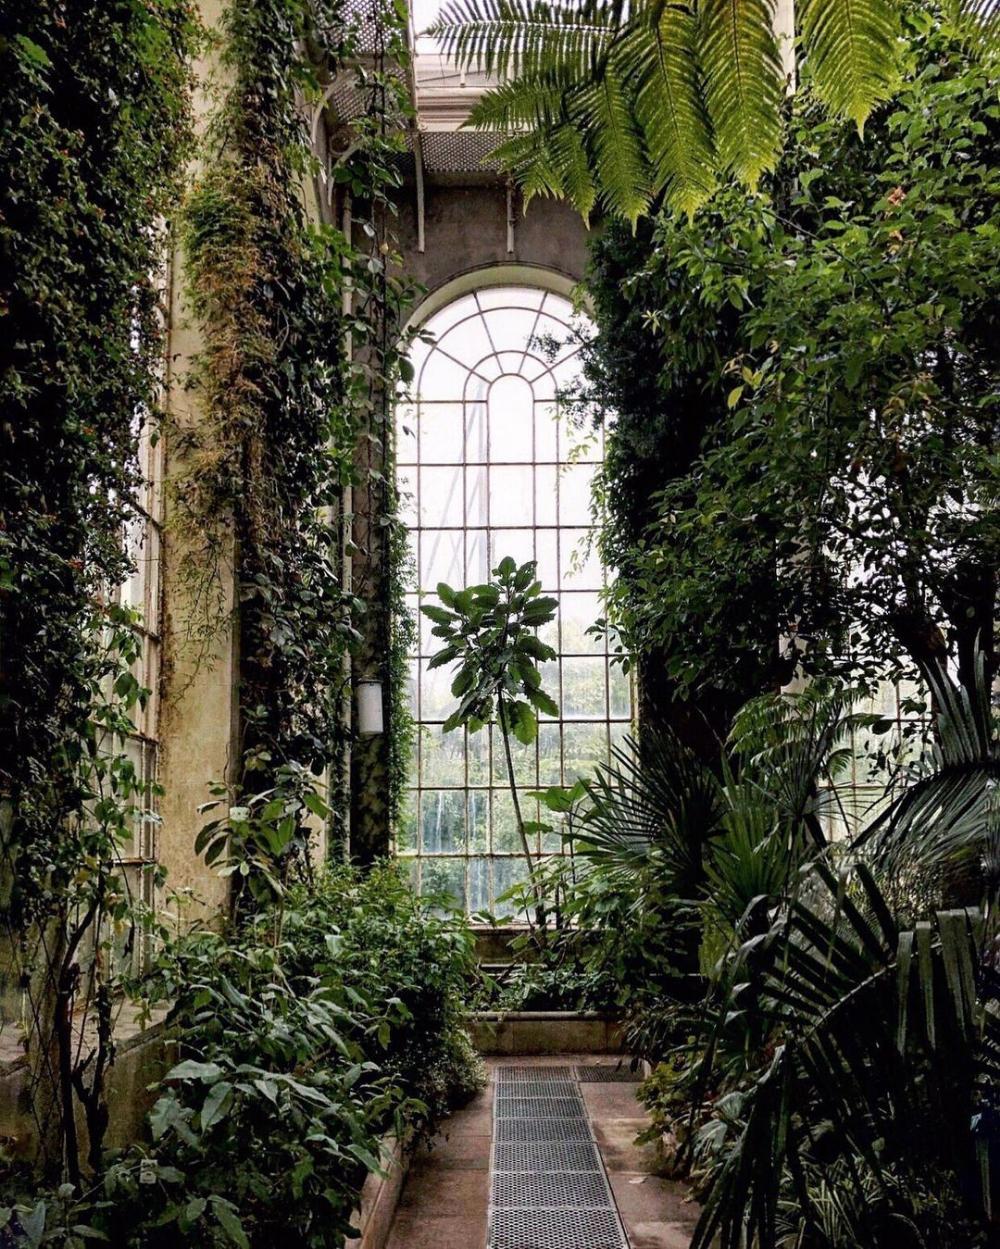 2e5eb87bae4c8009791d1c29d692aec4 - Places To Eat Near Botanic Gardens Edinburgh